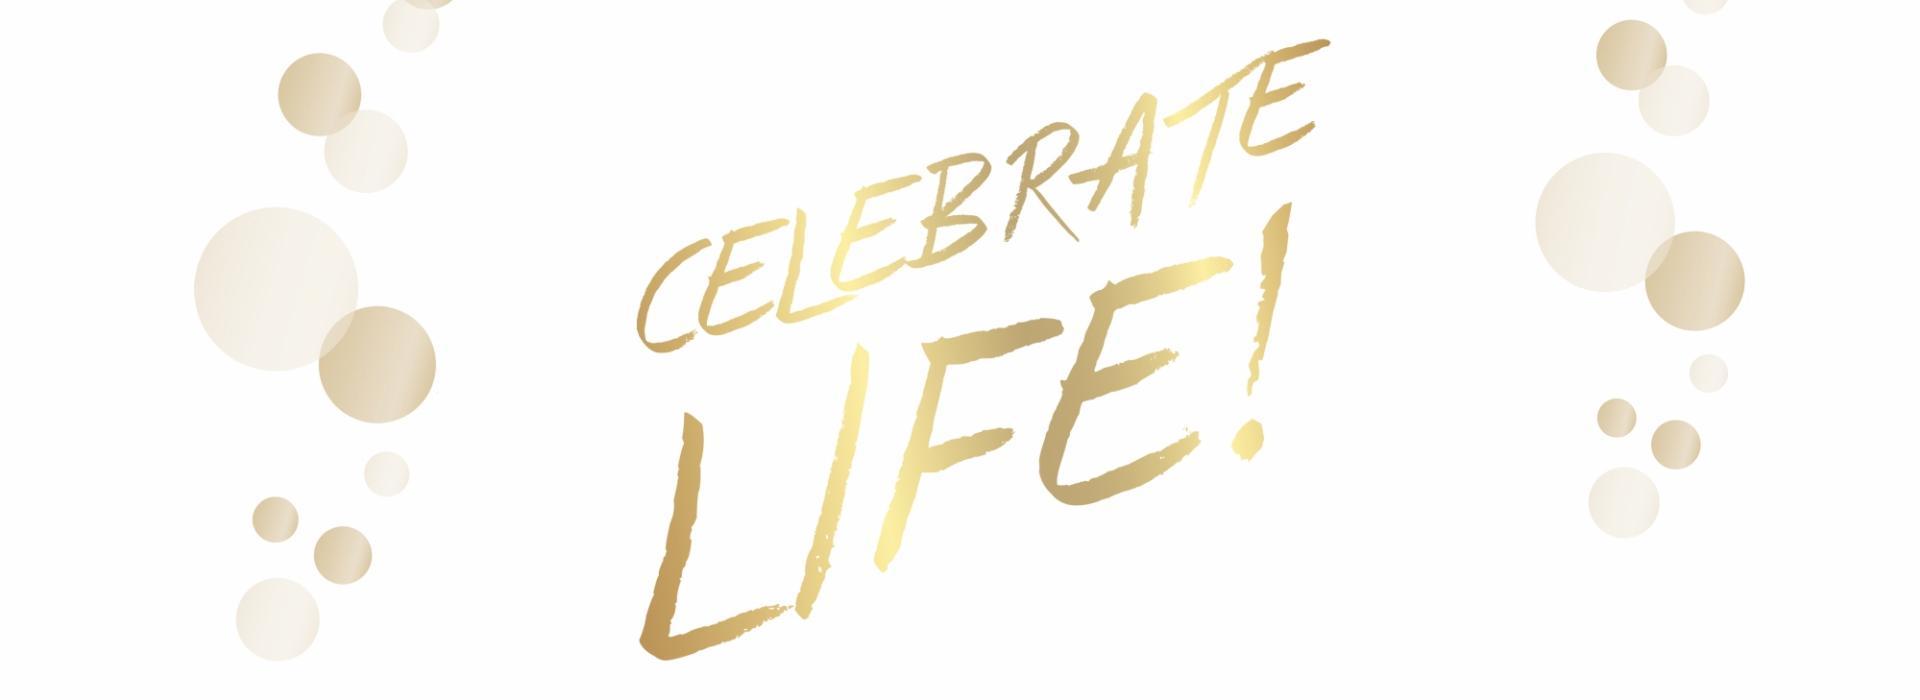 1553687294_0_Celebrate_Life_3840x1400px_02-625b36eaac1780f38a73a2642520c7e3.jpg